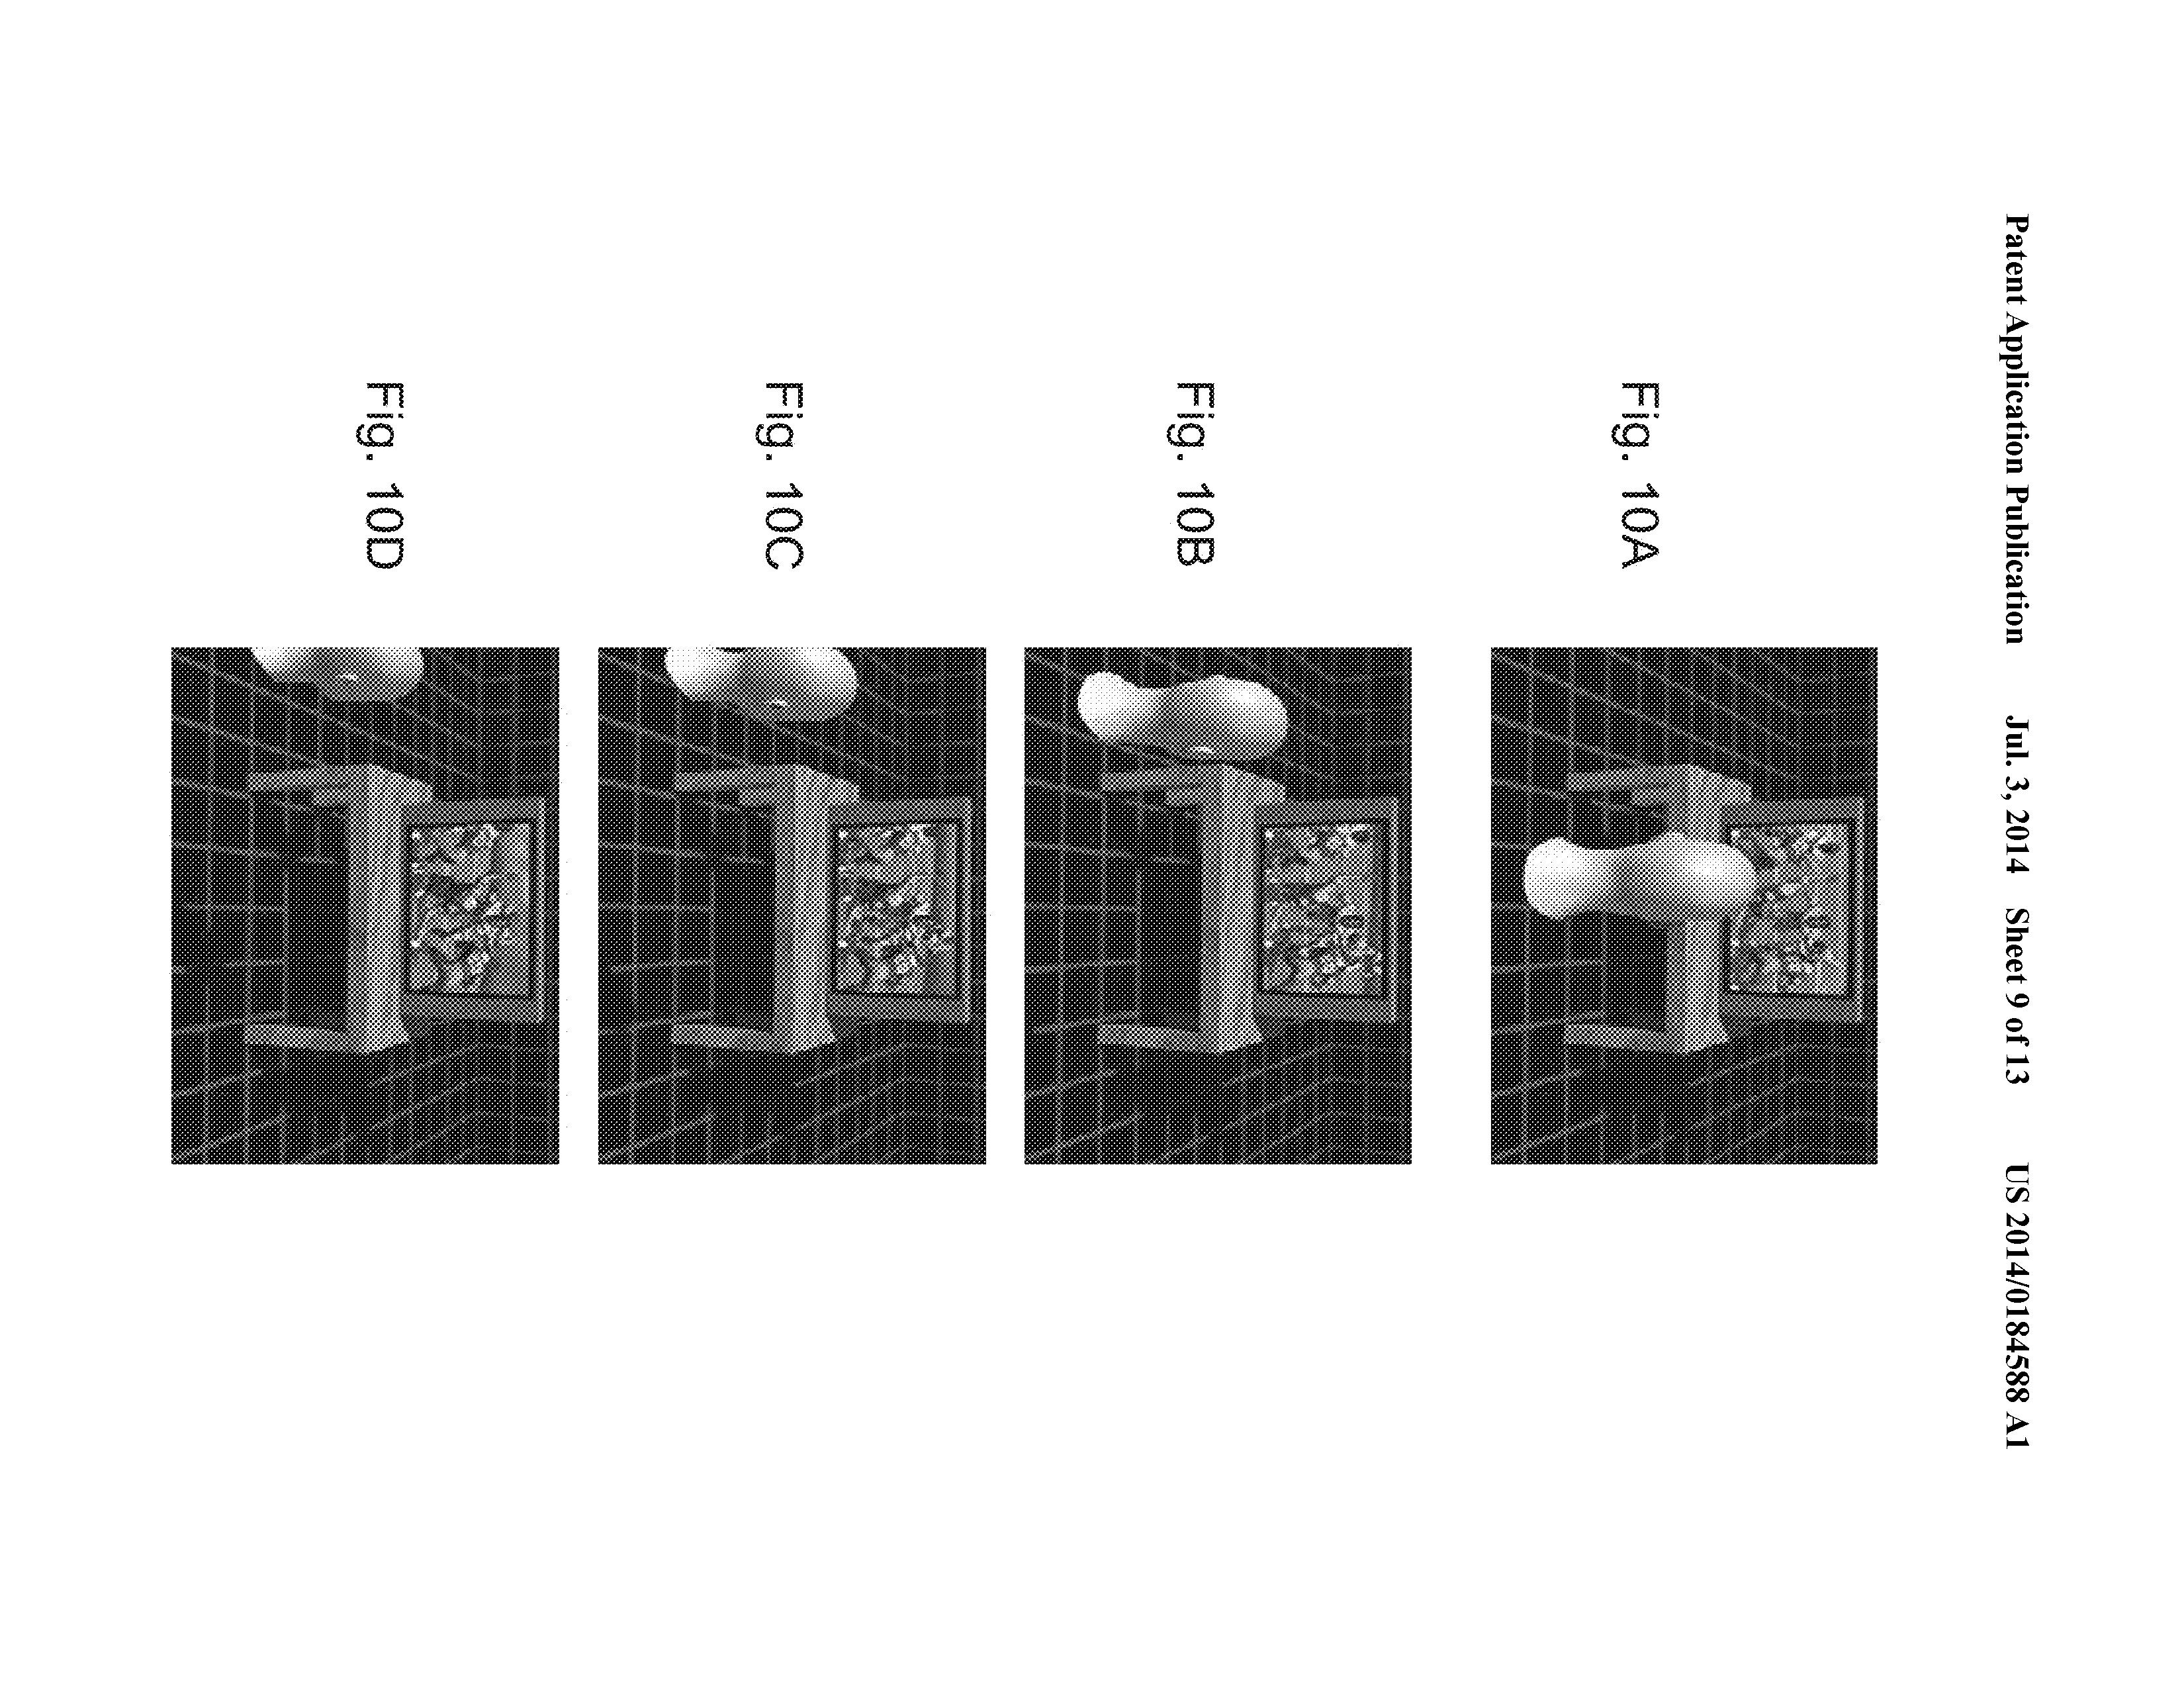 nintendo-eye-patent-10